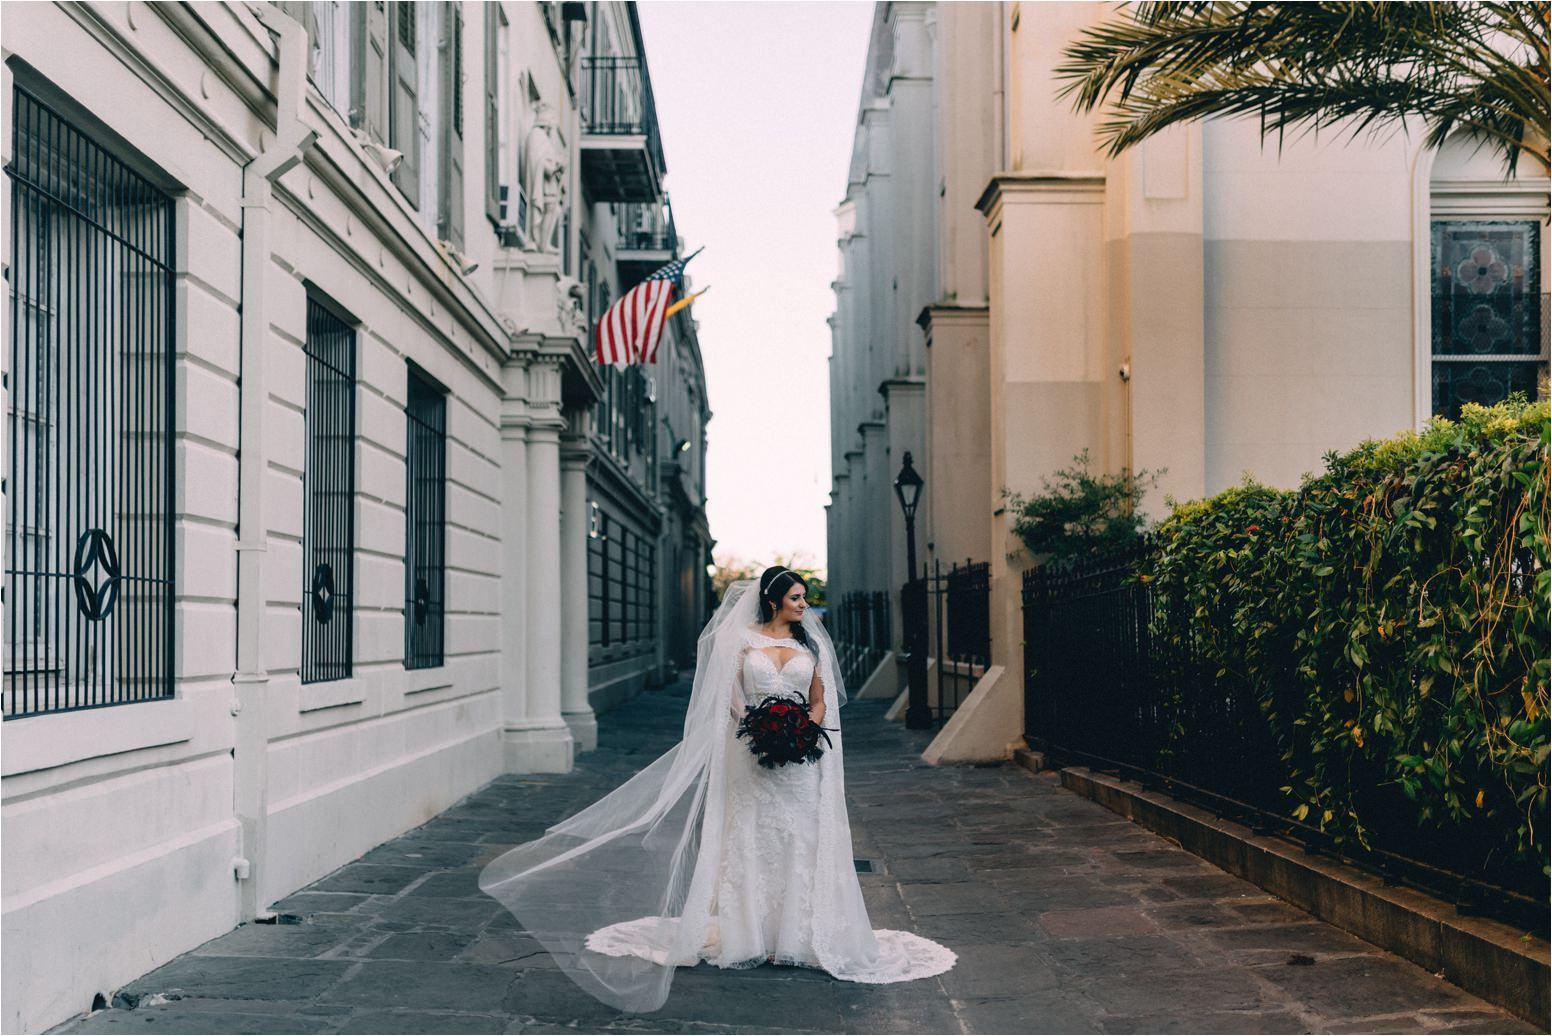 French Quarter Wedding 17